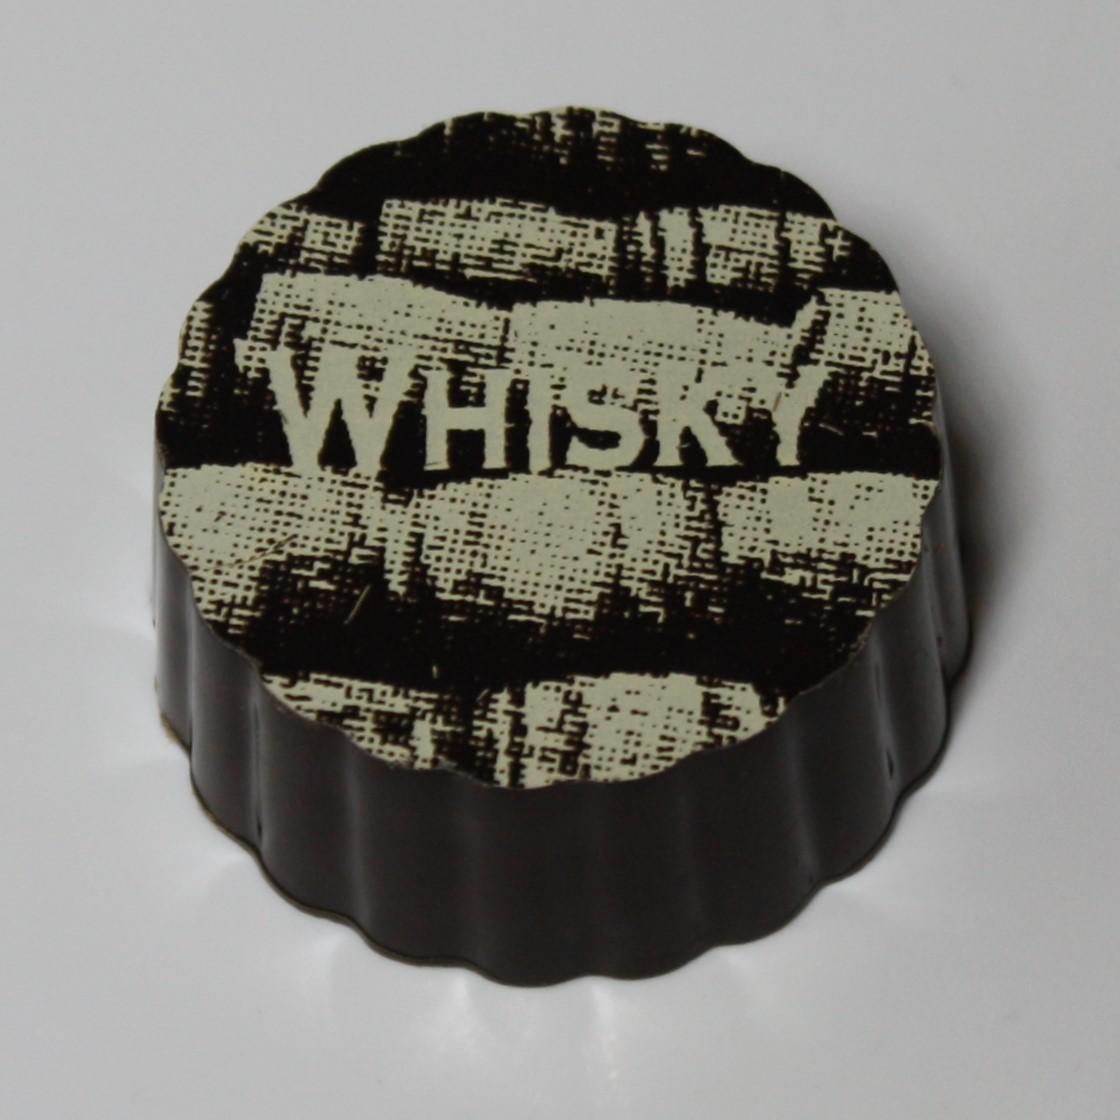 Whisky-puur.JPG